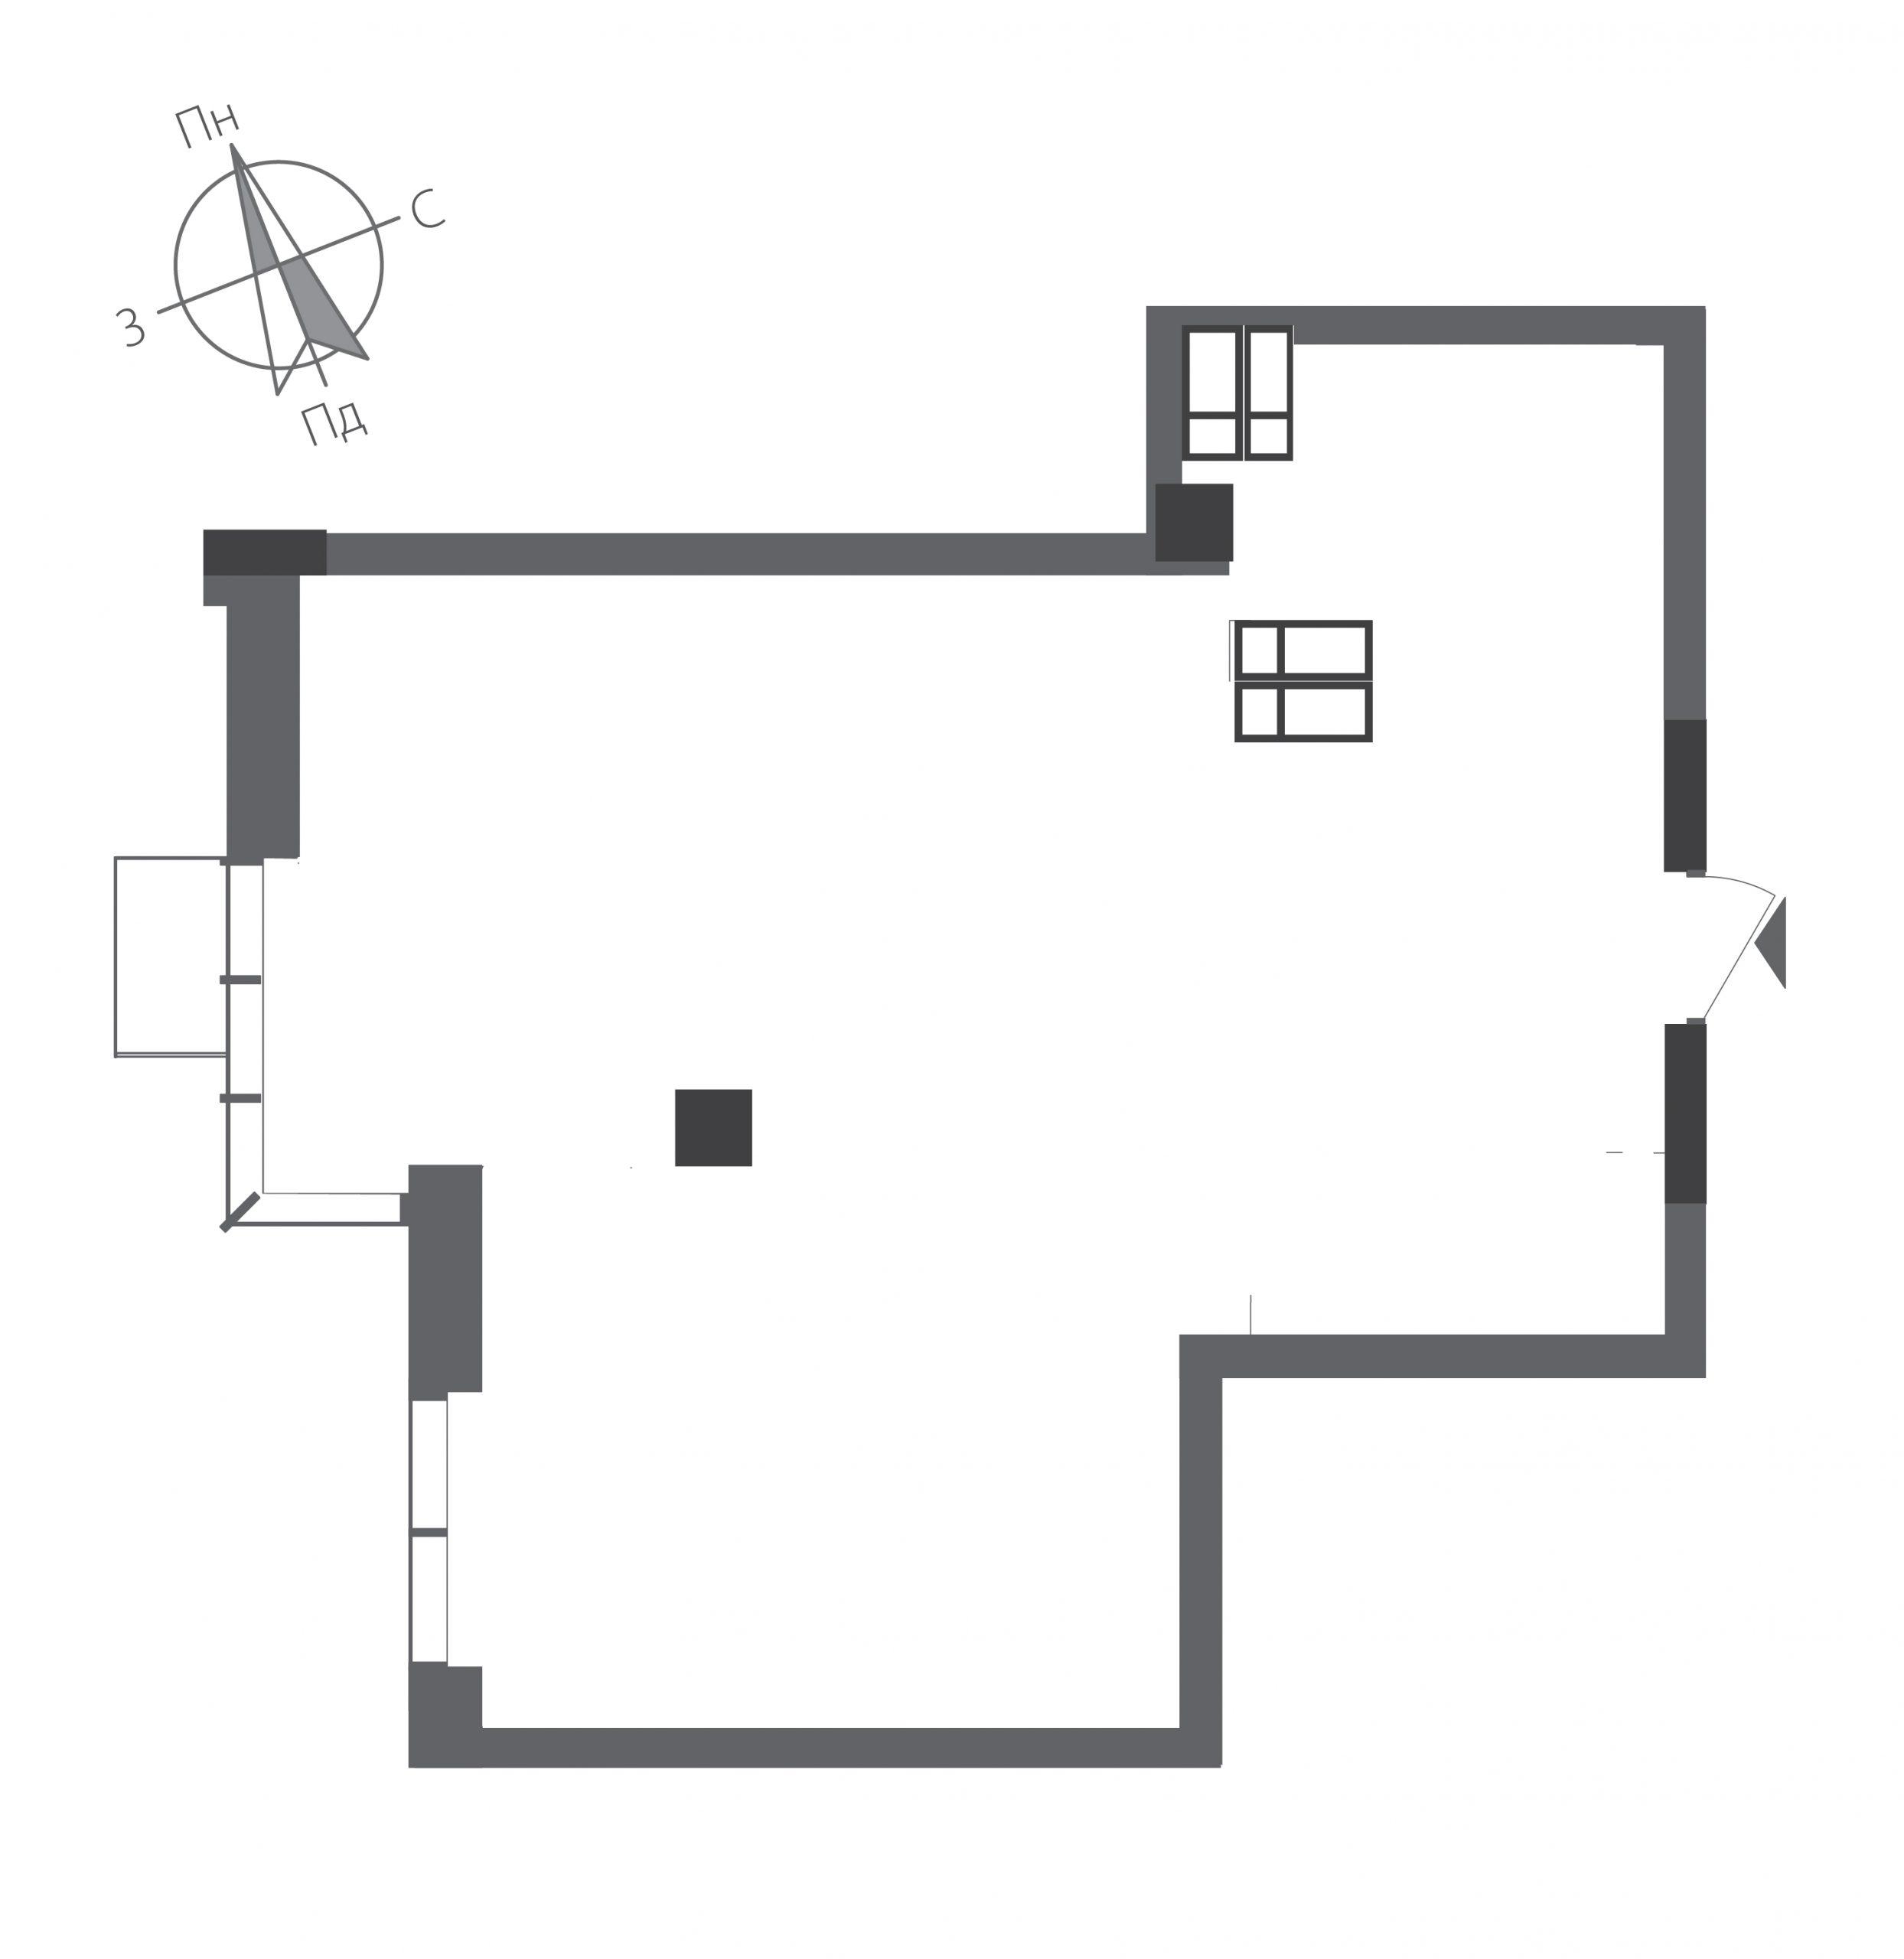 Однокімнатна квартира в ЖК RiverStone Номер квартири №21, Будинок 9, Поверх 21, Повна площа 58,52